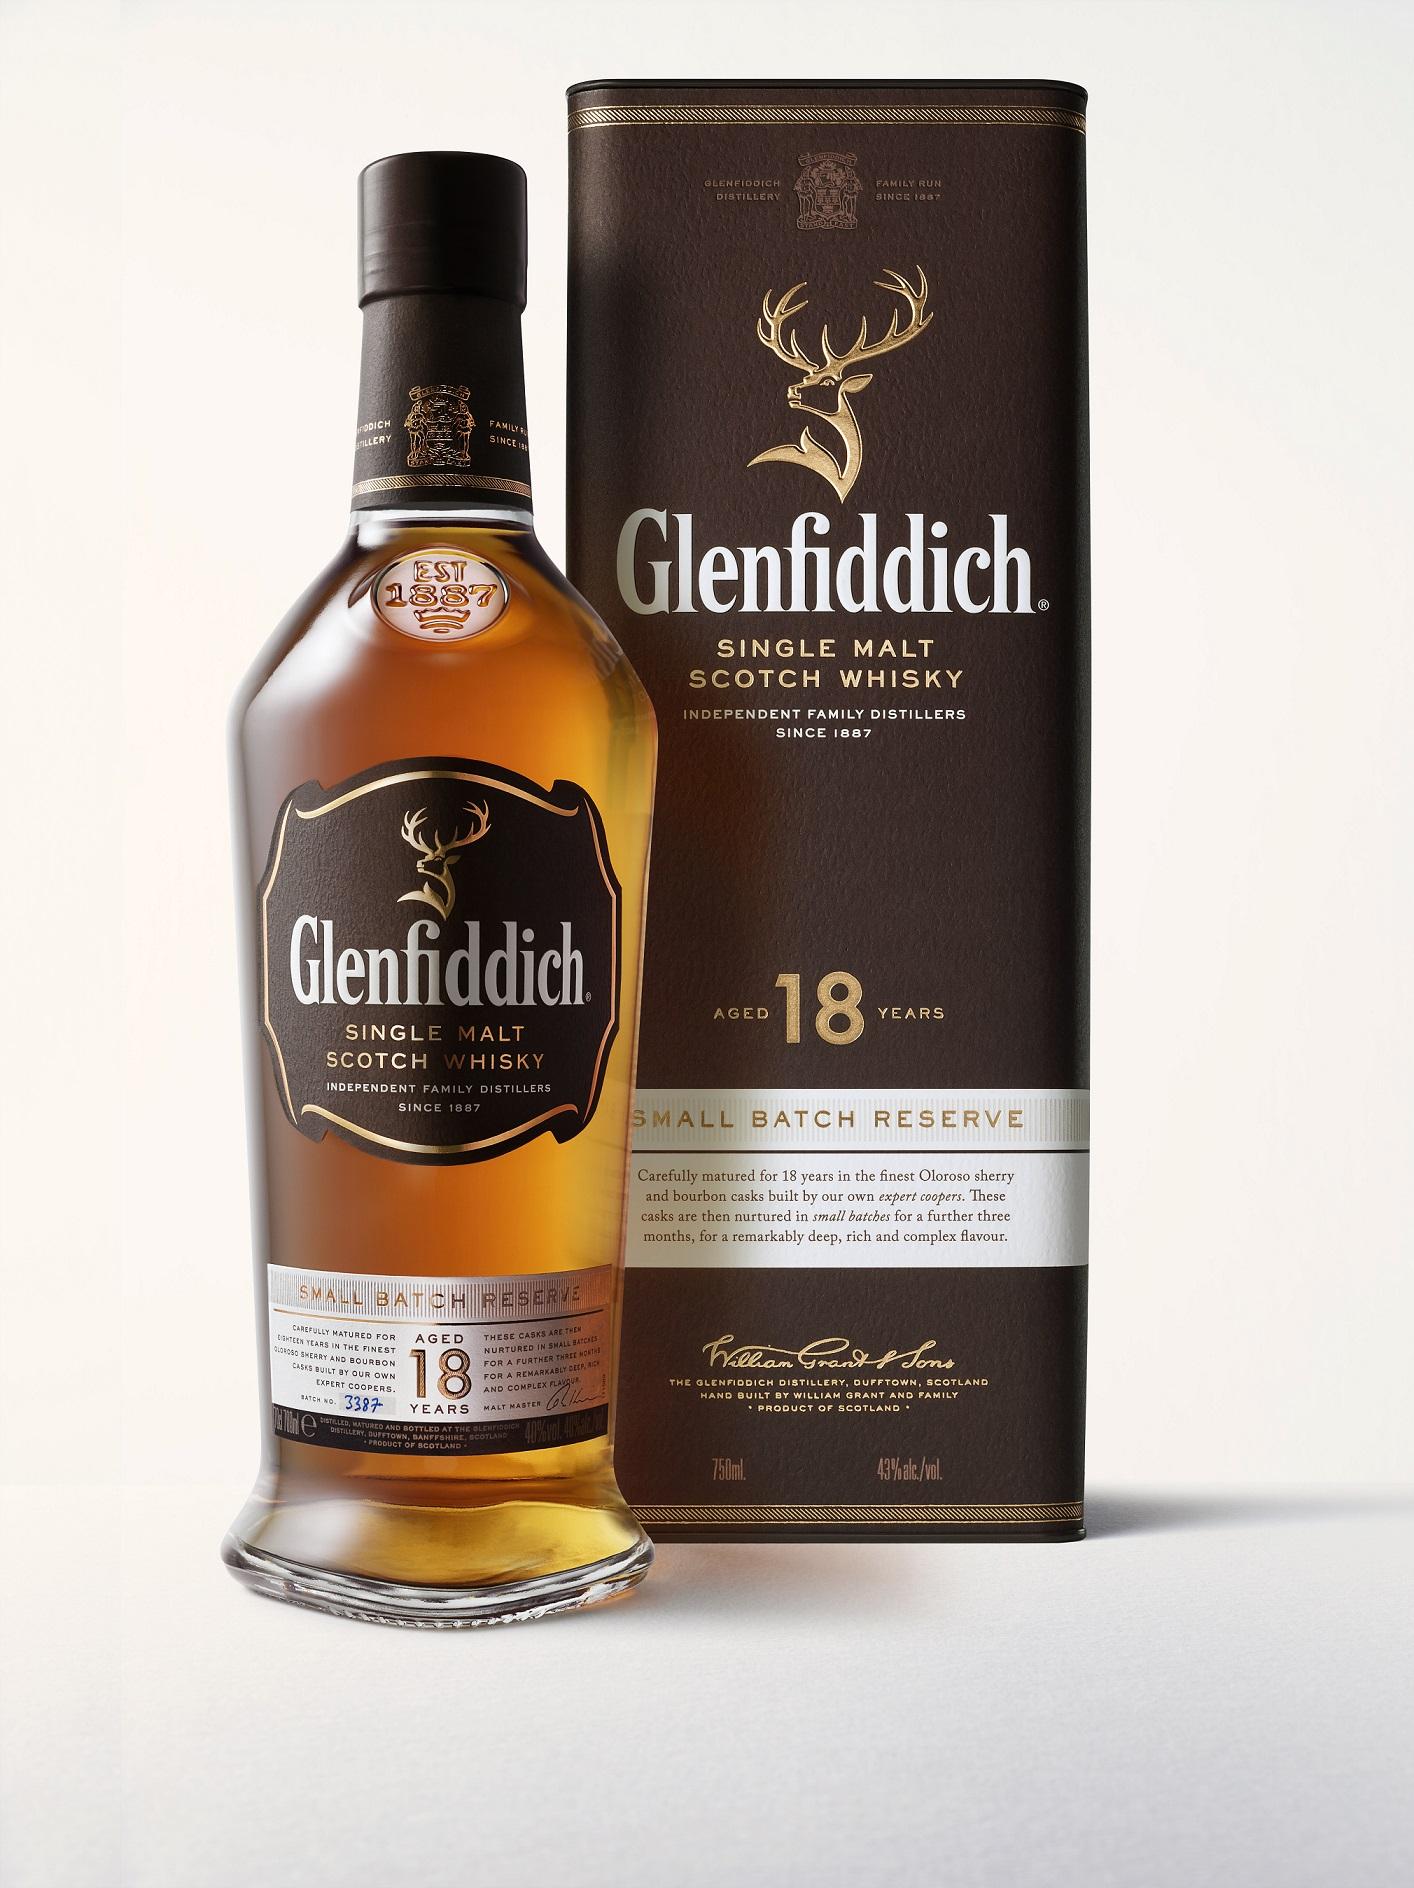 Glenfiddich 18 Jahre Small Batch Reserve Whisky